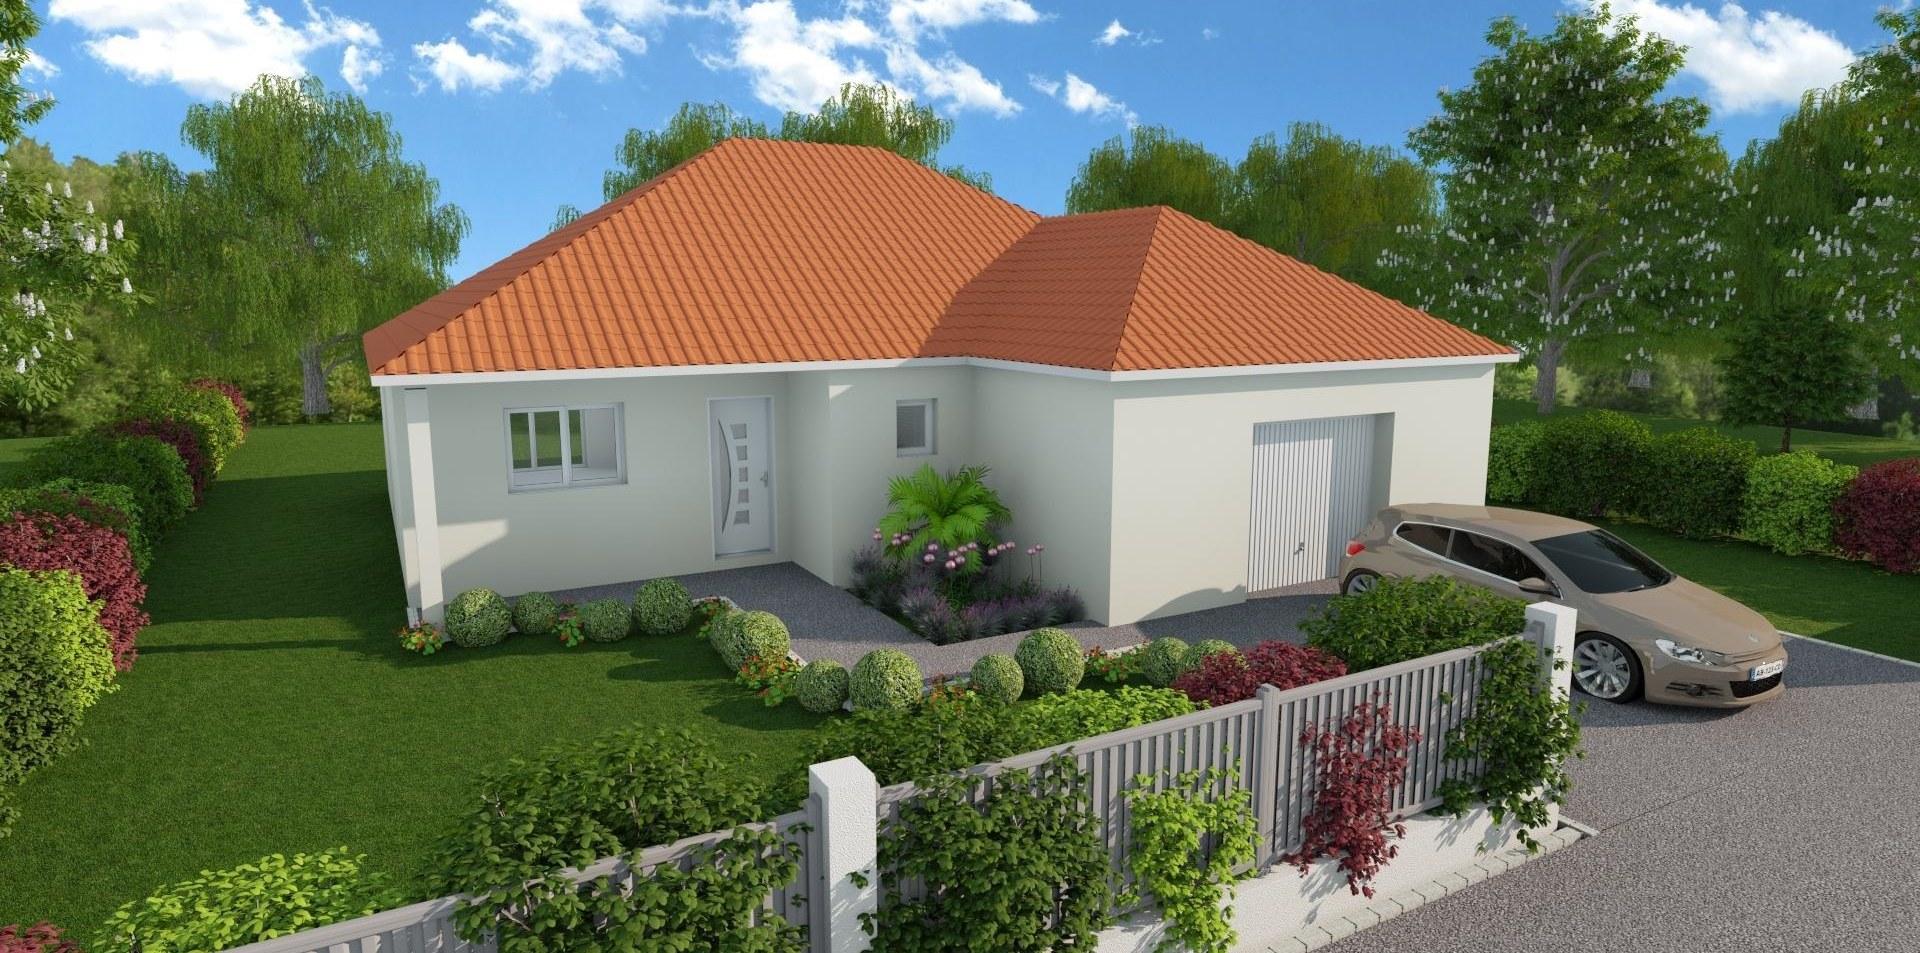 Construire sa maison sur mesure interesting construire for Prix mini maison sur mesure